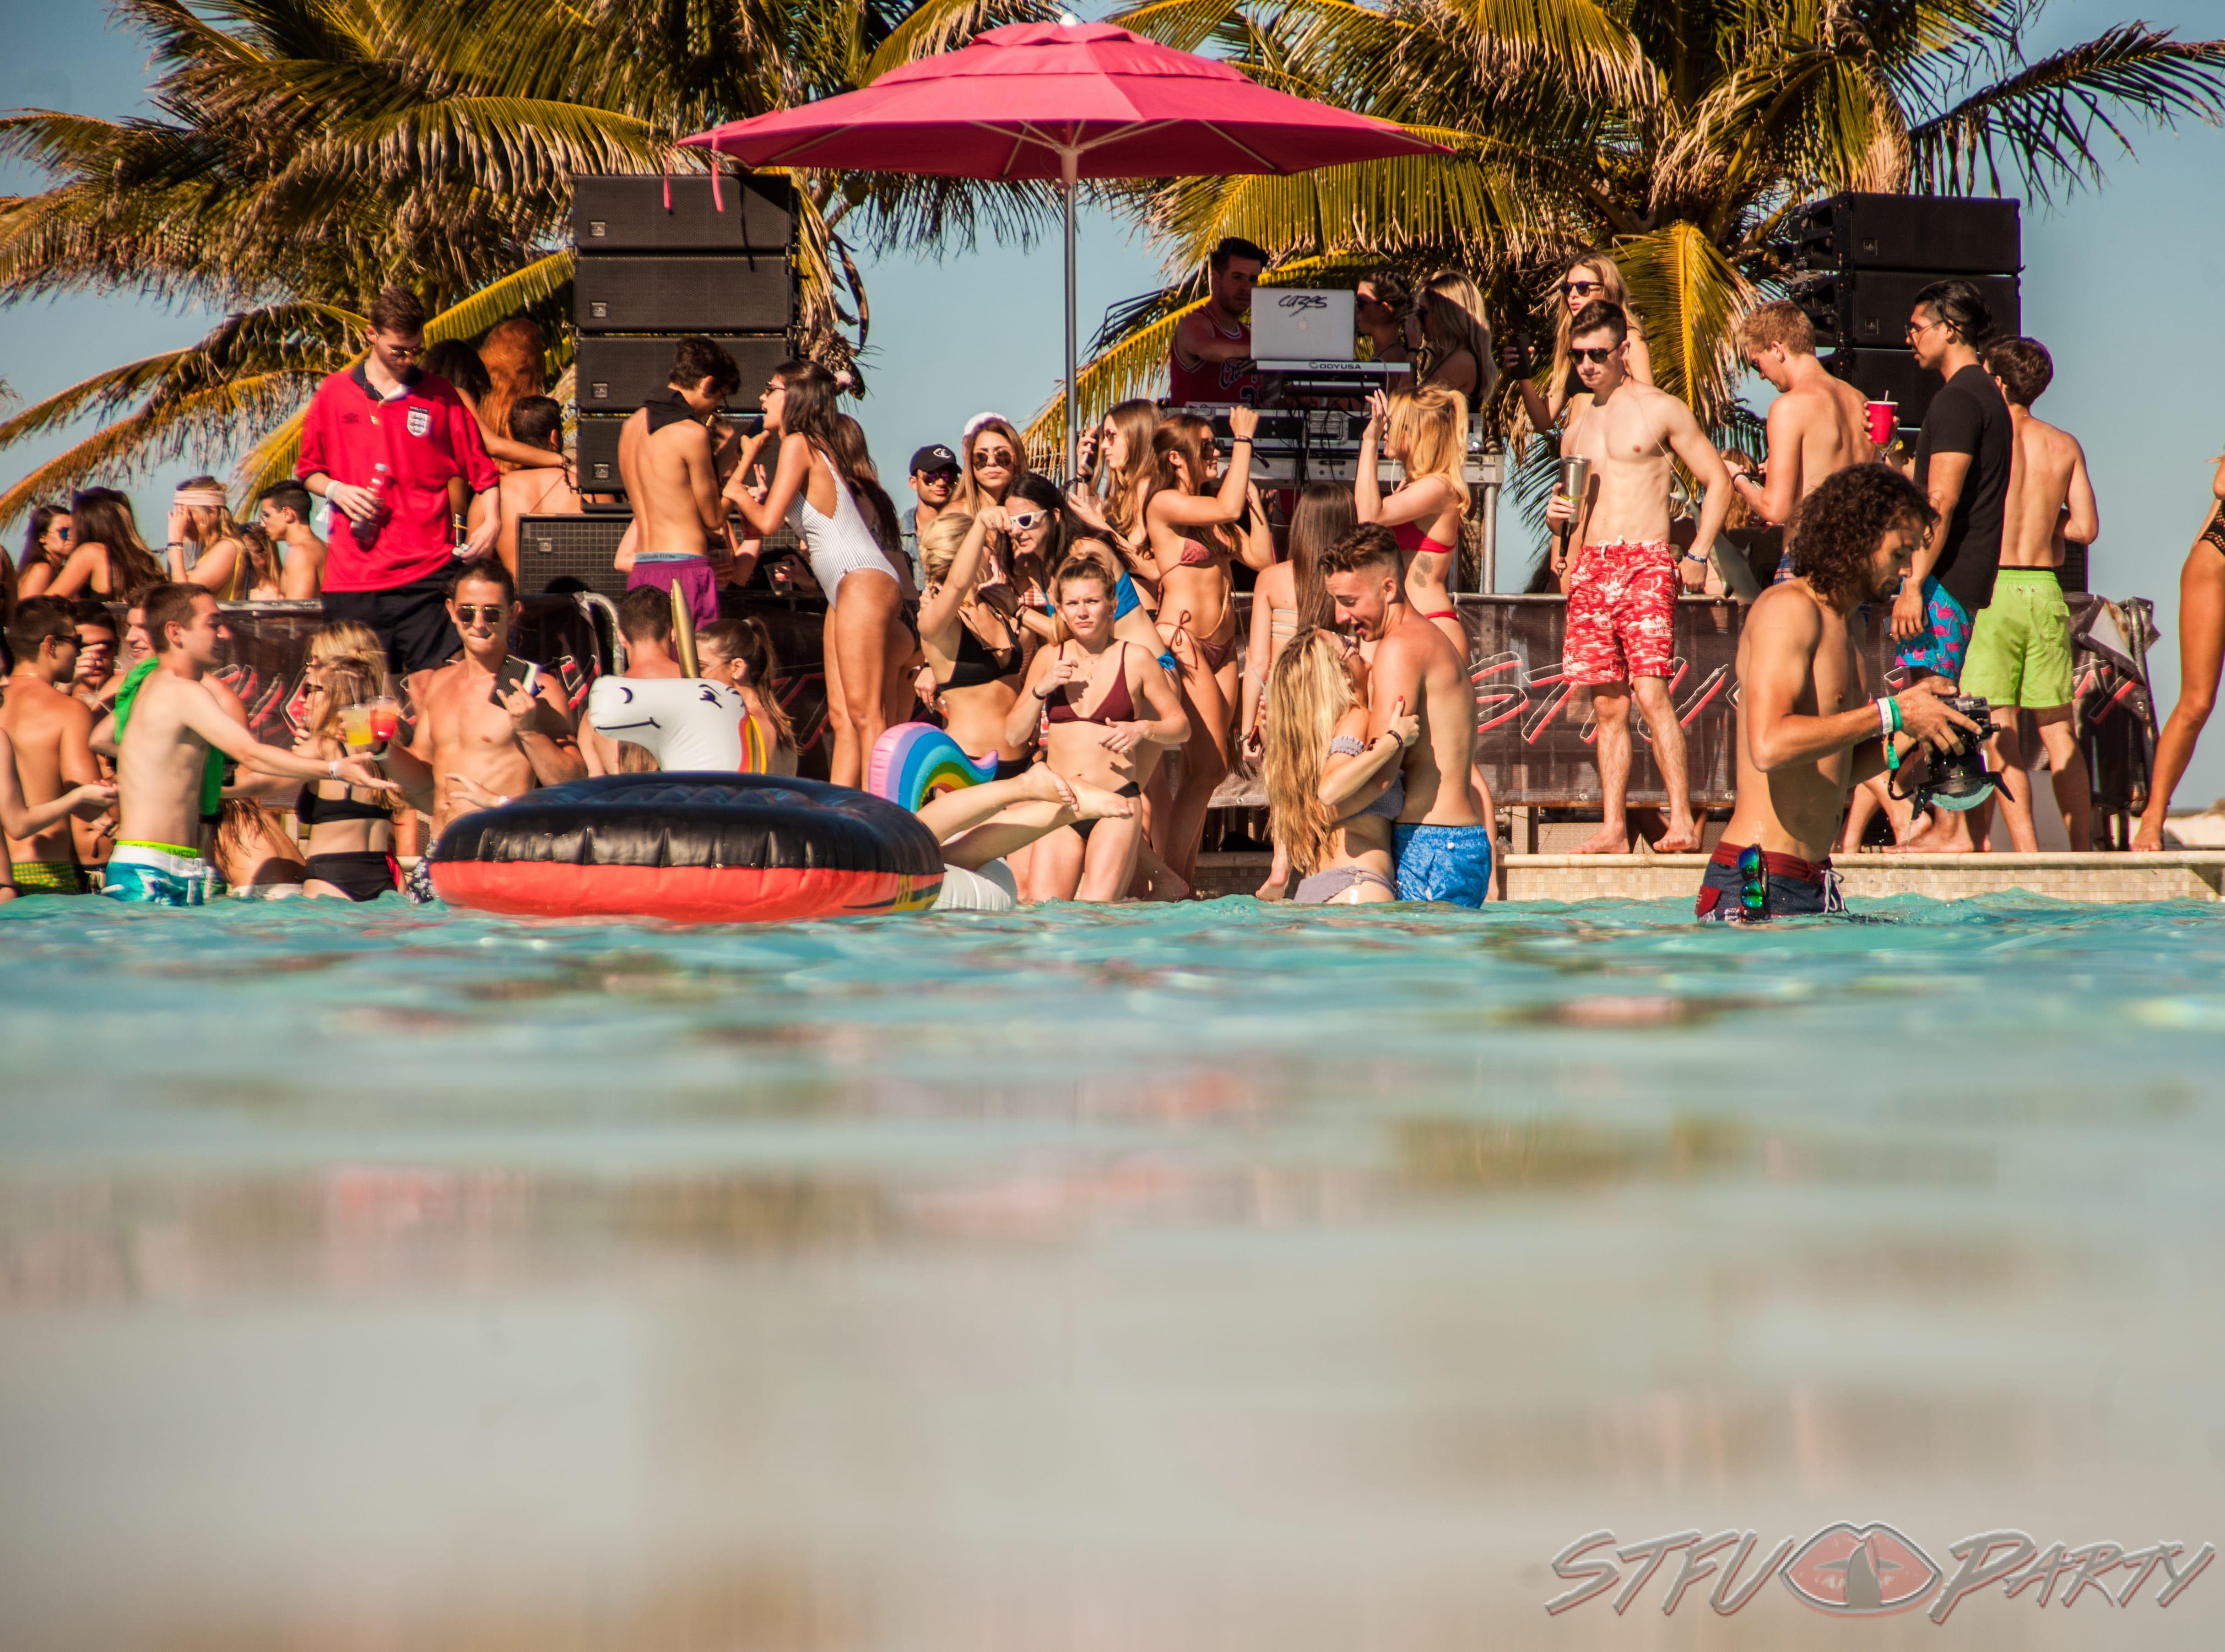 Best Spring Break Destinations 2020 STFU Bimini Spring Break 2020 | STFU & Party